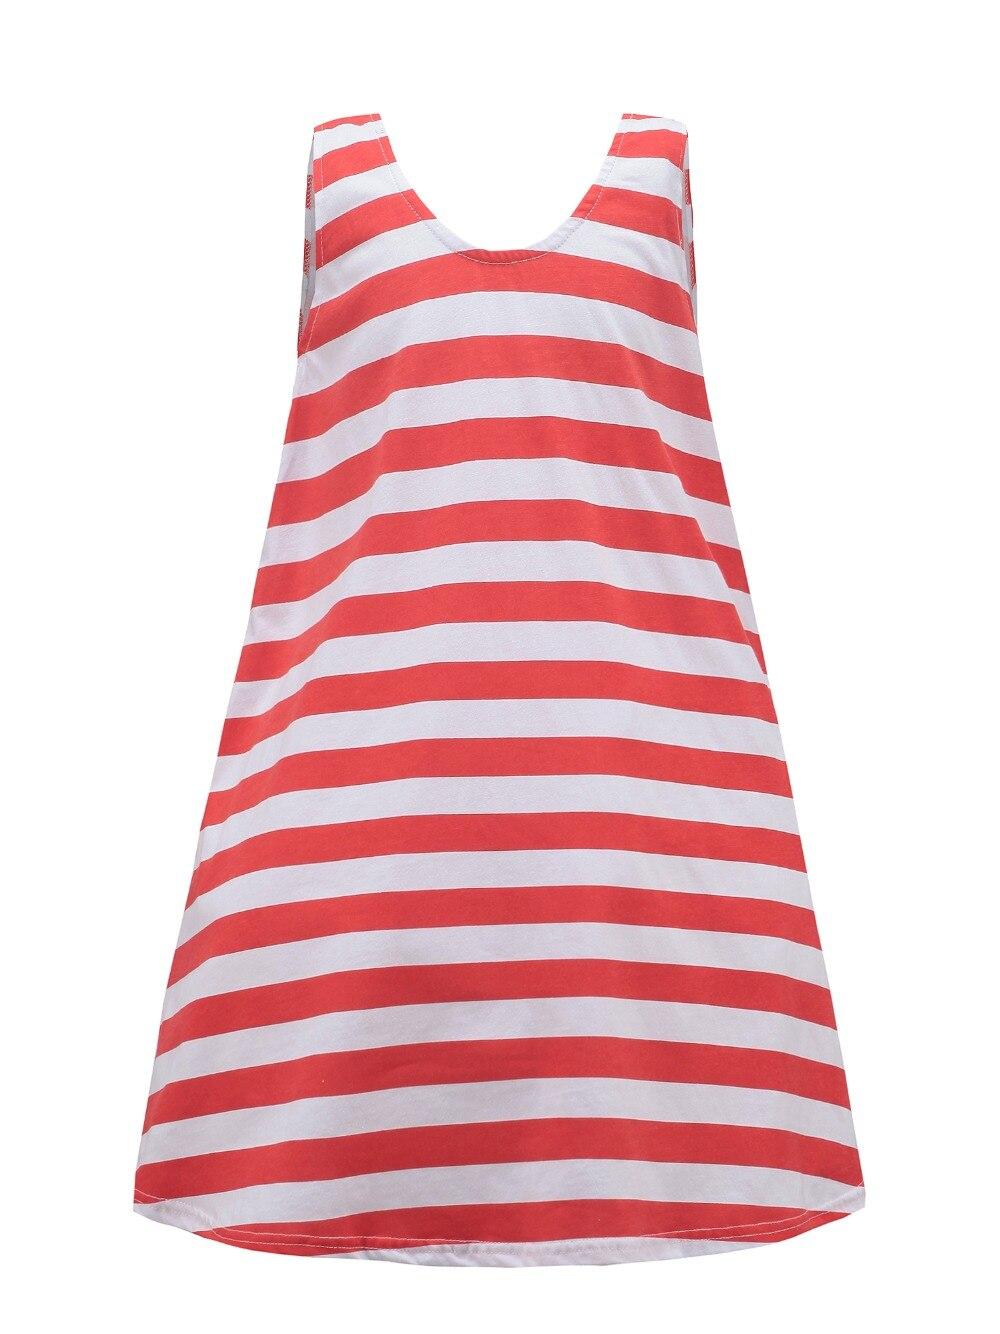 ⑤Al por menor! Niñas verano Vestidos 2015 niño niña ropa casual ...